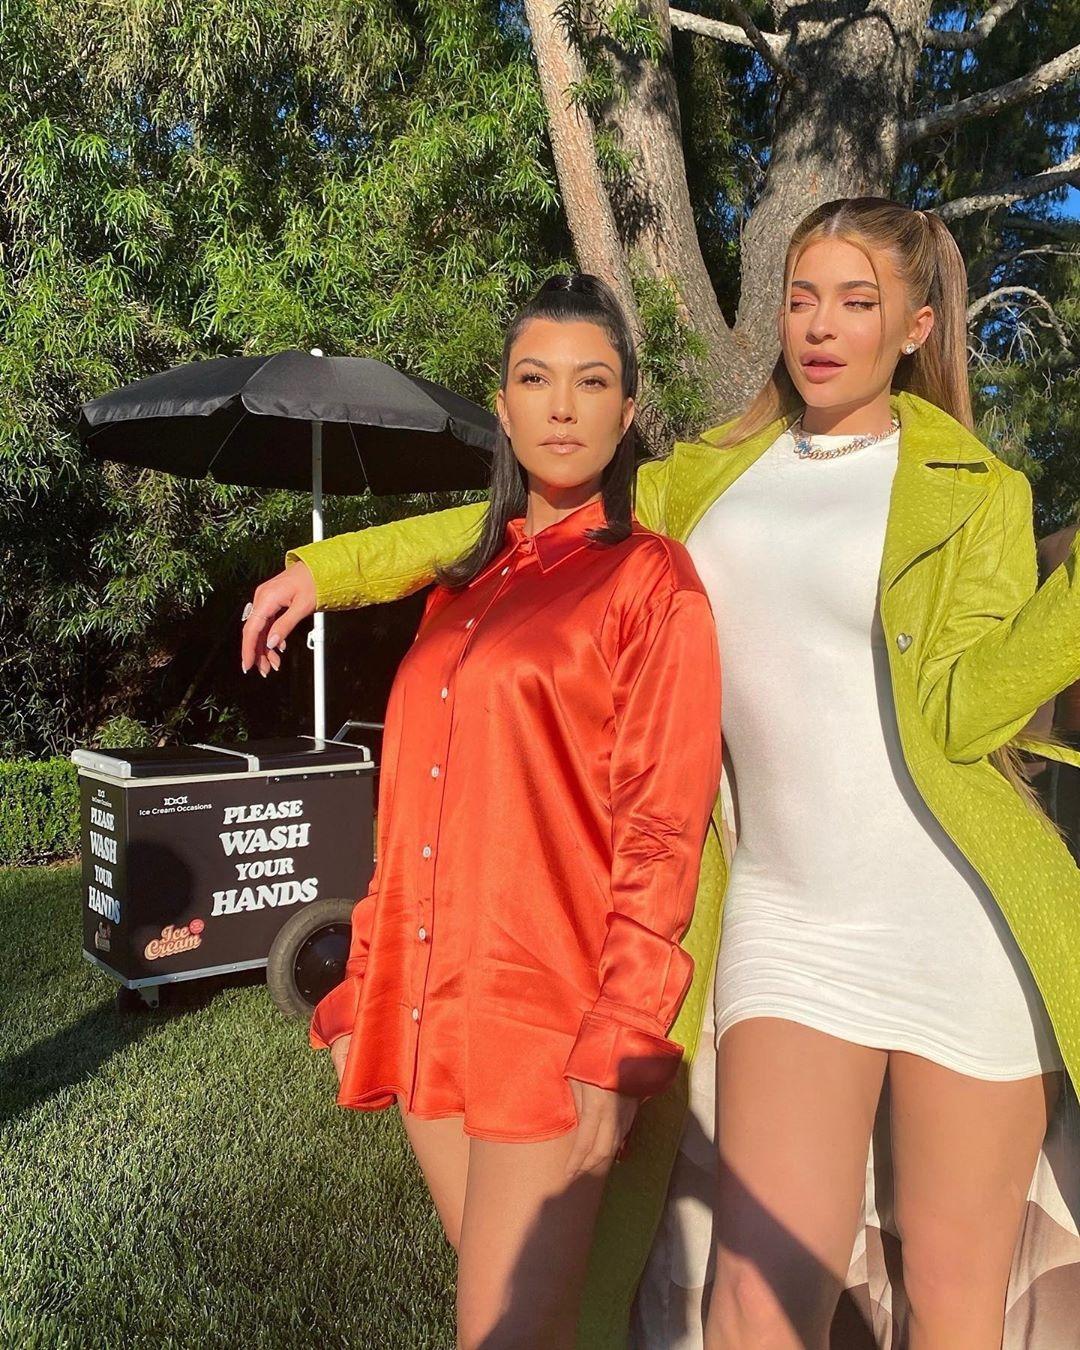 Kourtney Kardashian rocking a Oversized shiny burnt orange shirt with a satin fabric, extra long sleeves, shirt collar, button front and curved hem